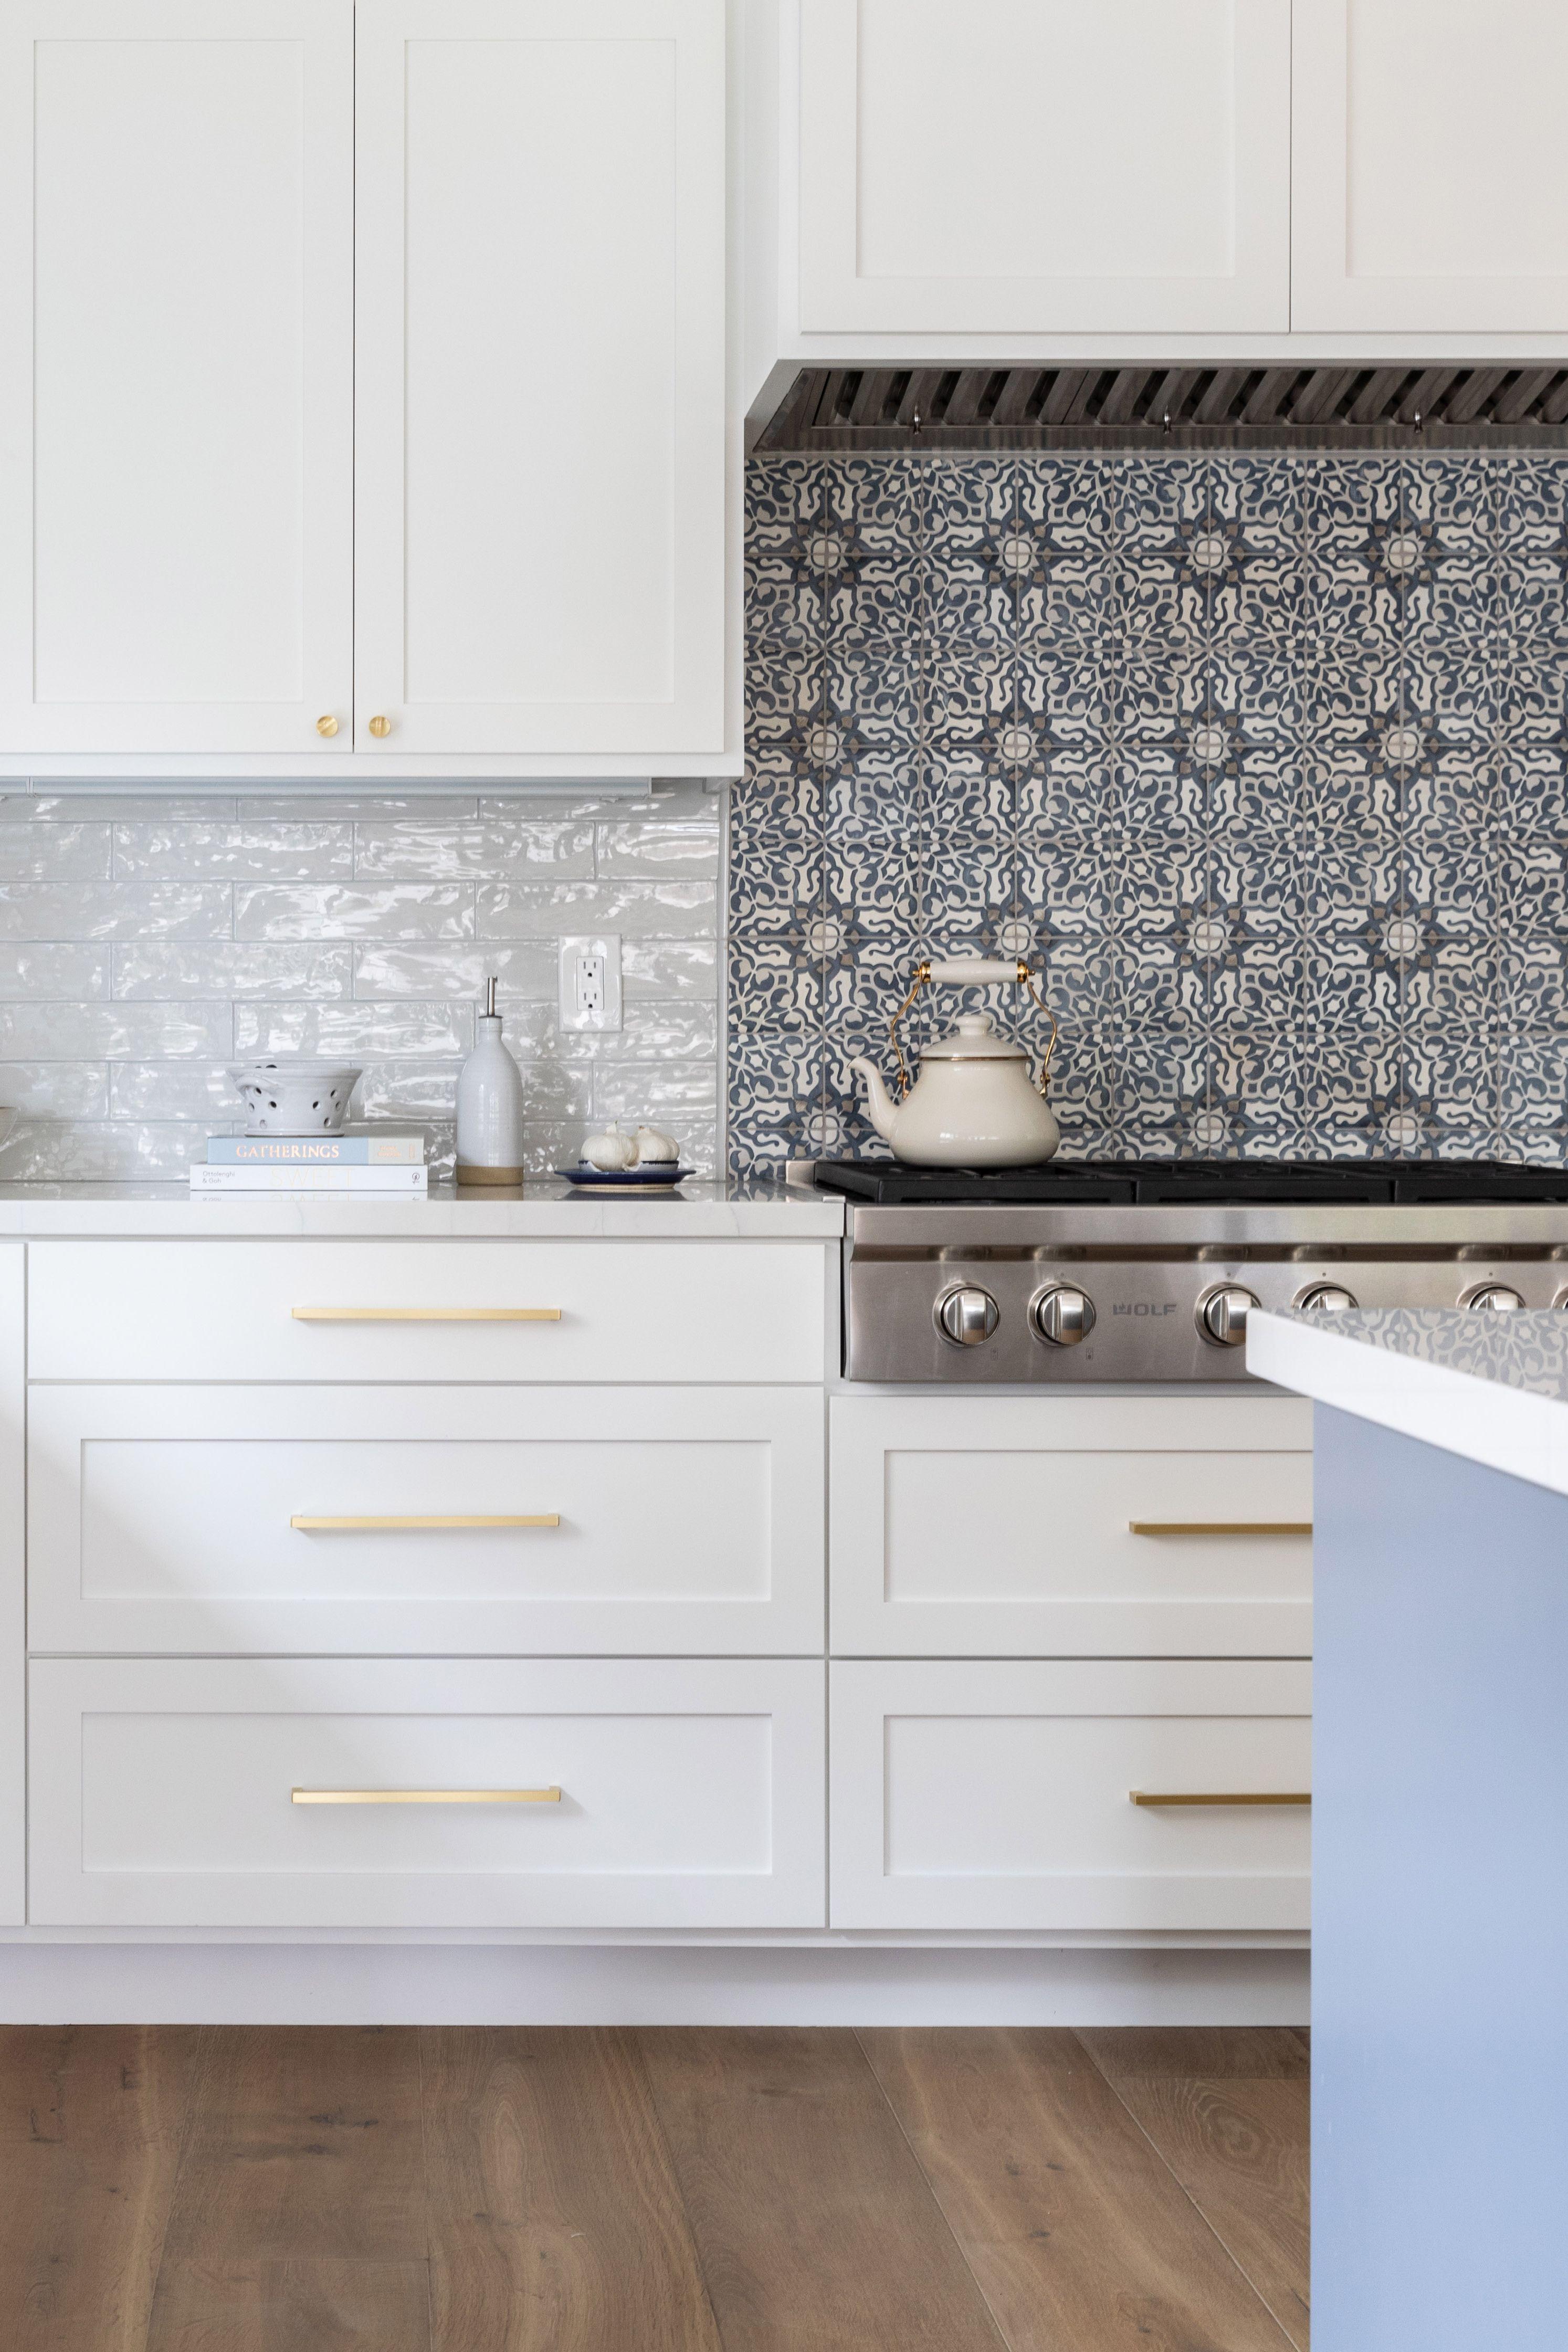 71 walker zanger ceramic tile ideas in